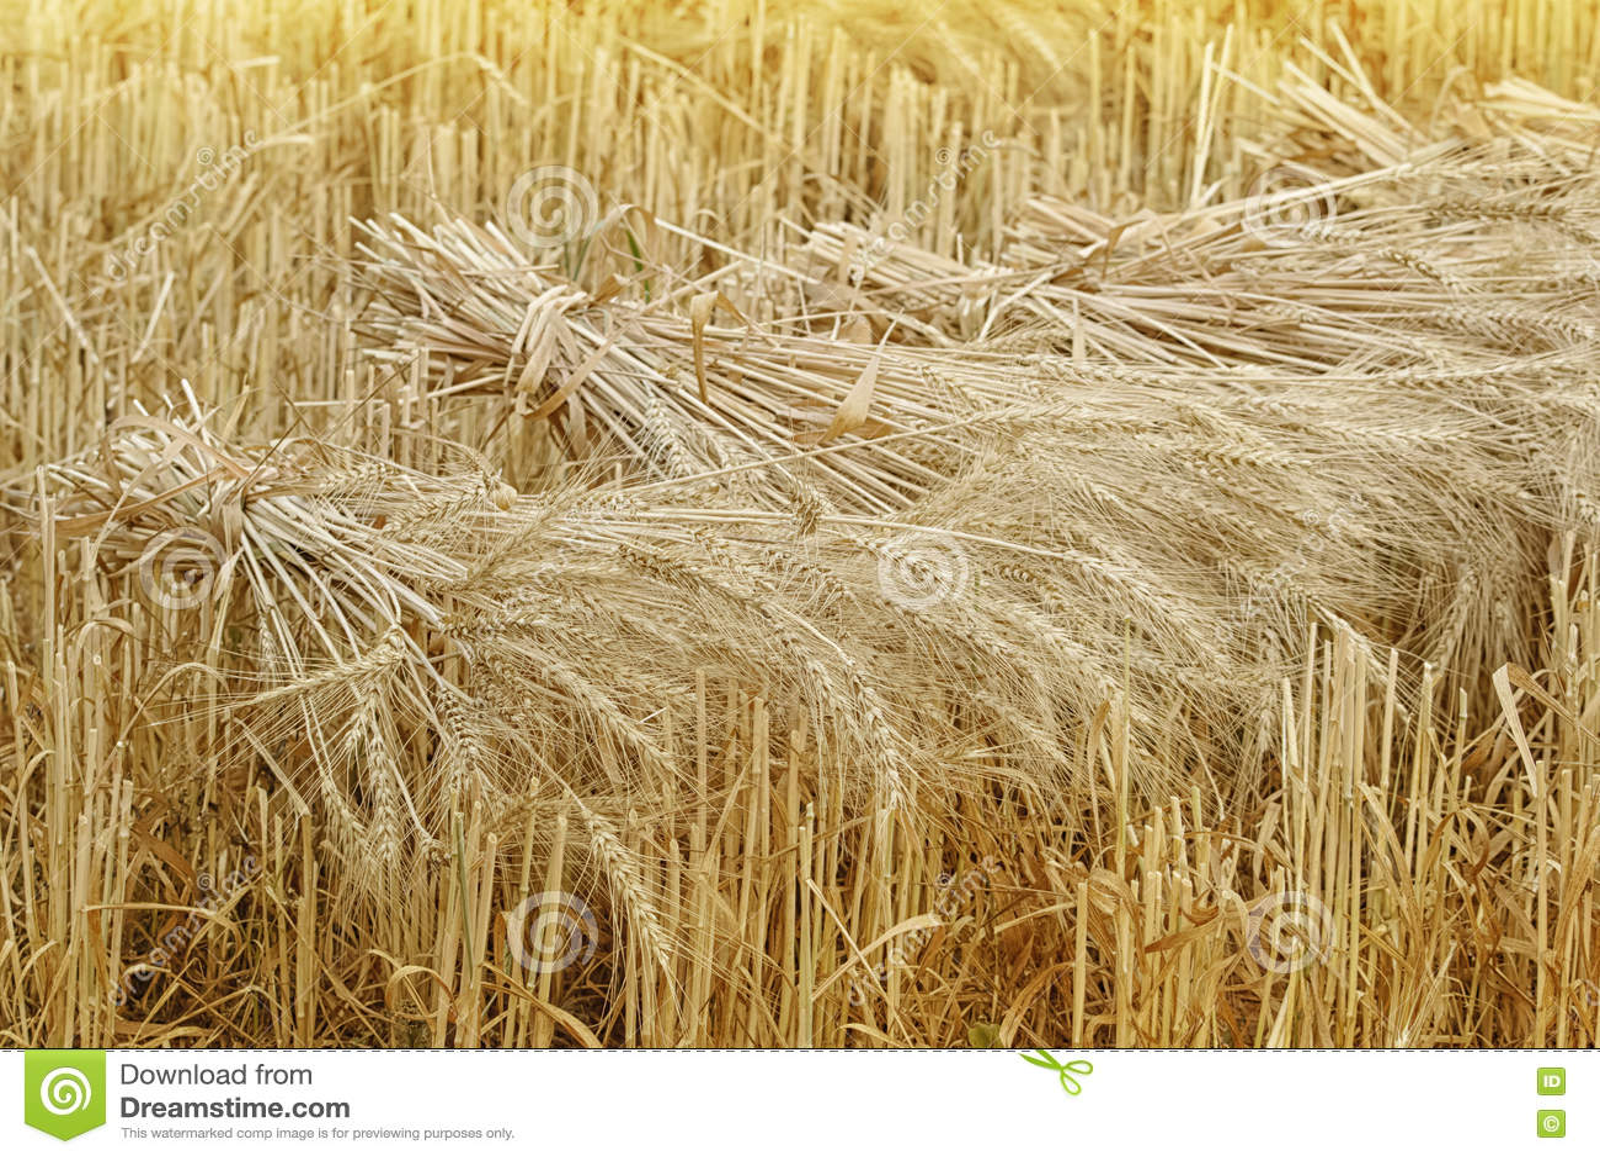 wheat sheaves at the